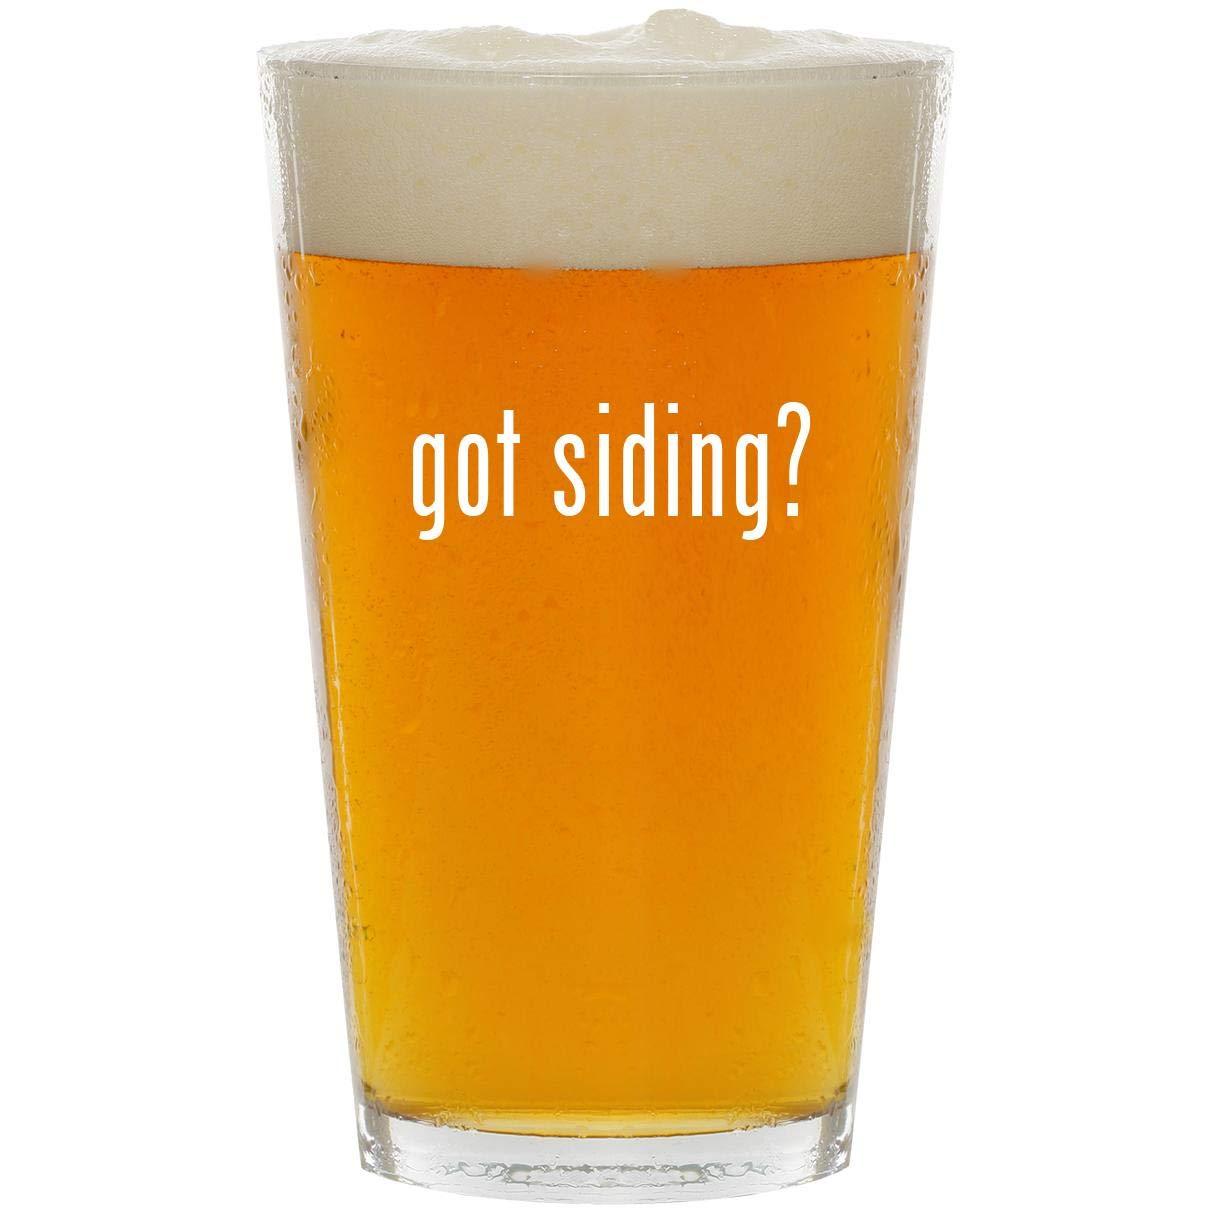 got siding? - Glass 16oz Beer Pint